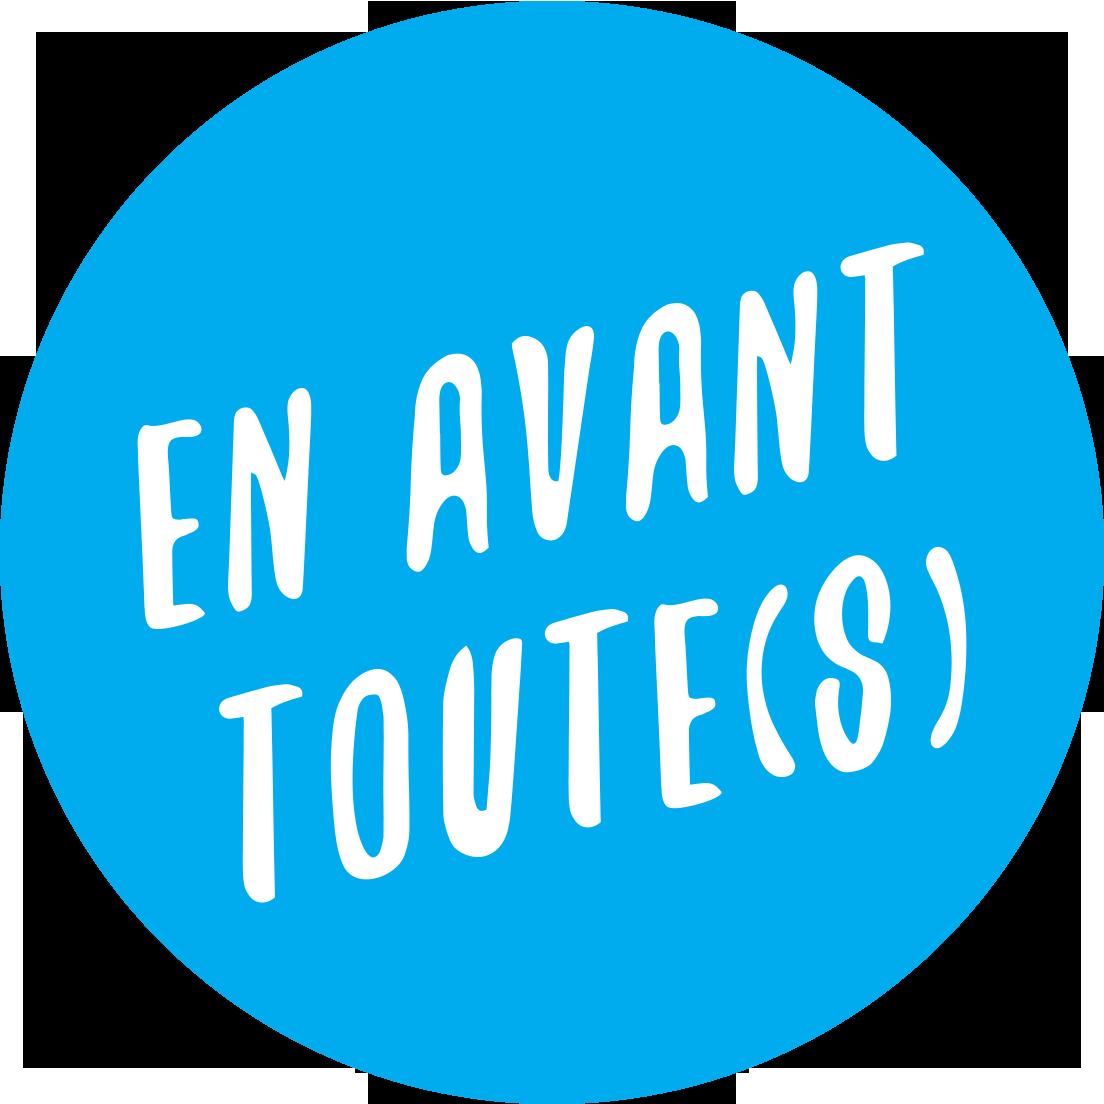 Logo En Avant Toute(s)